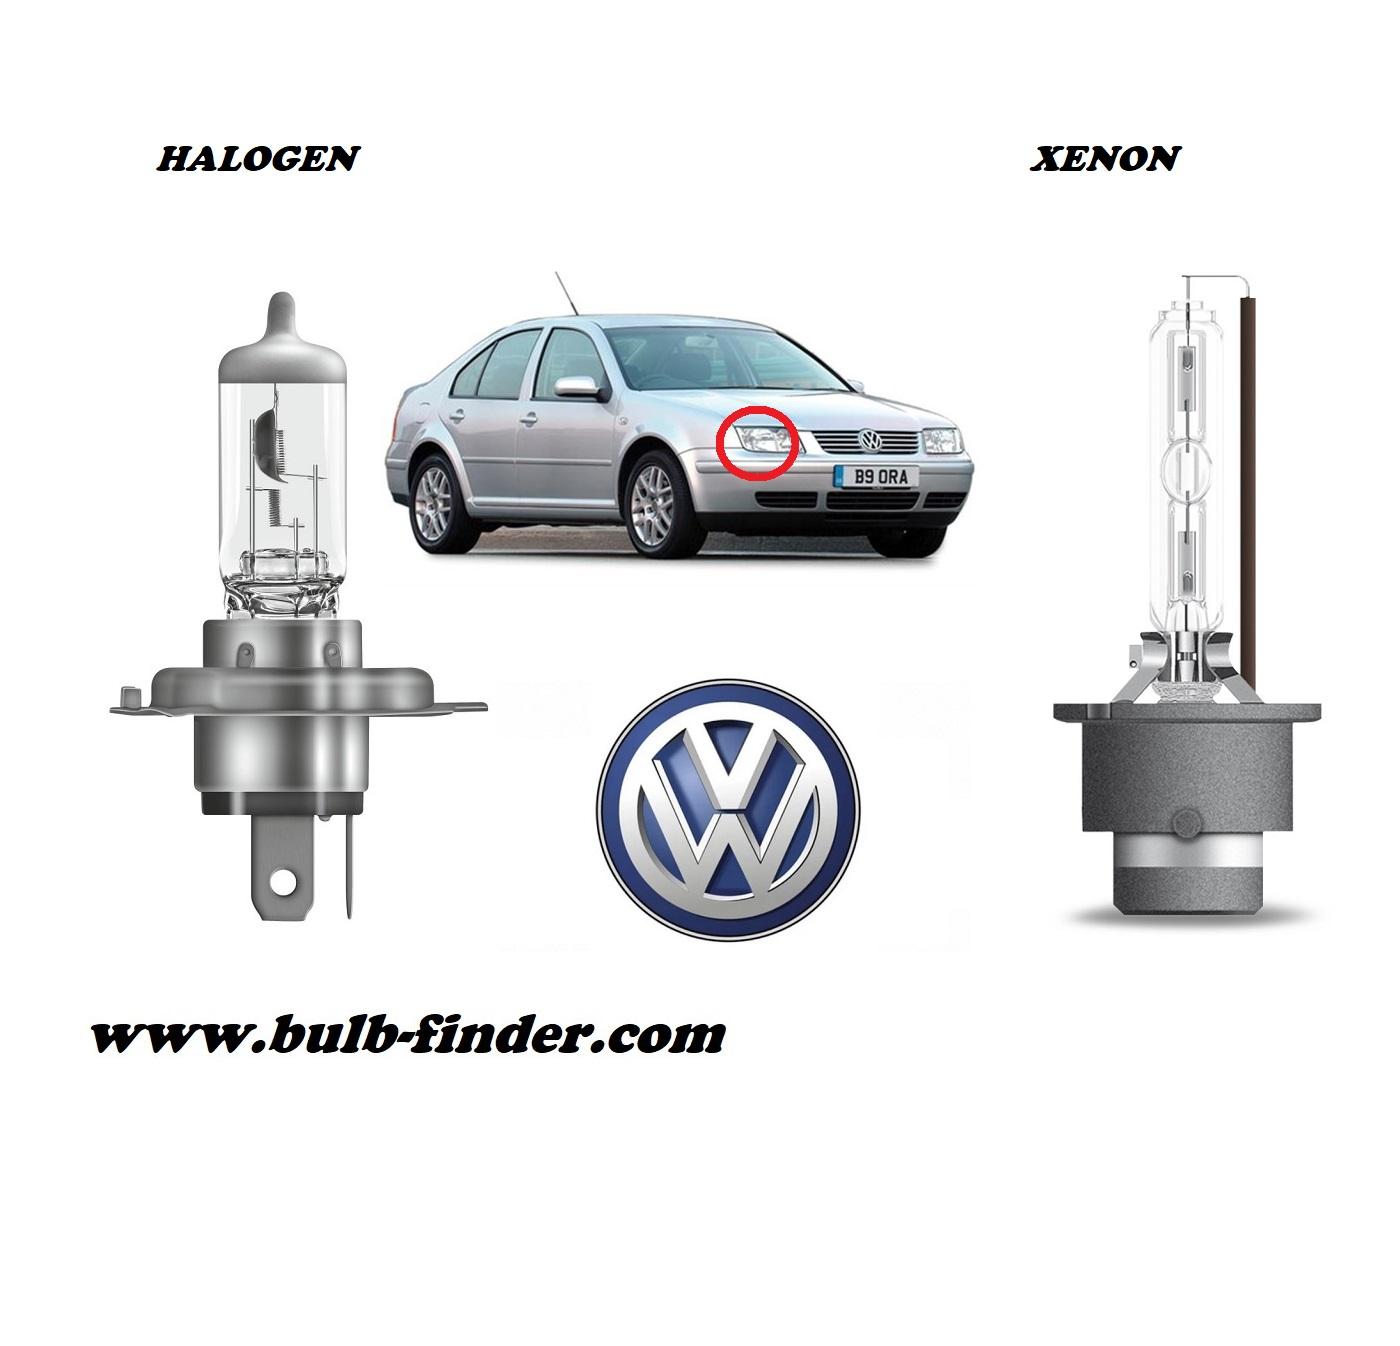 VW Bora model bulb for LOW BEAM HEADLIGHT specification